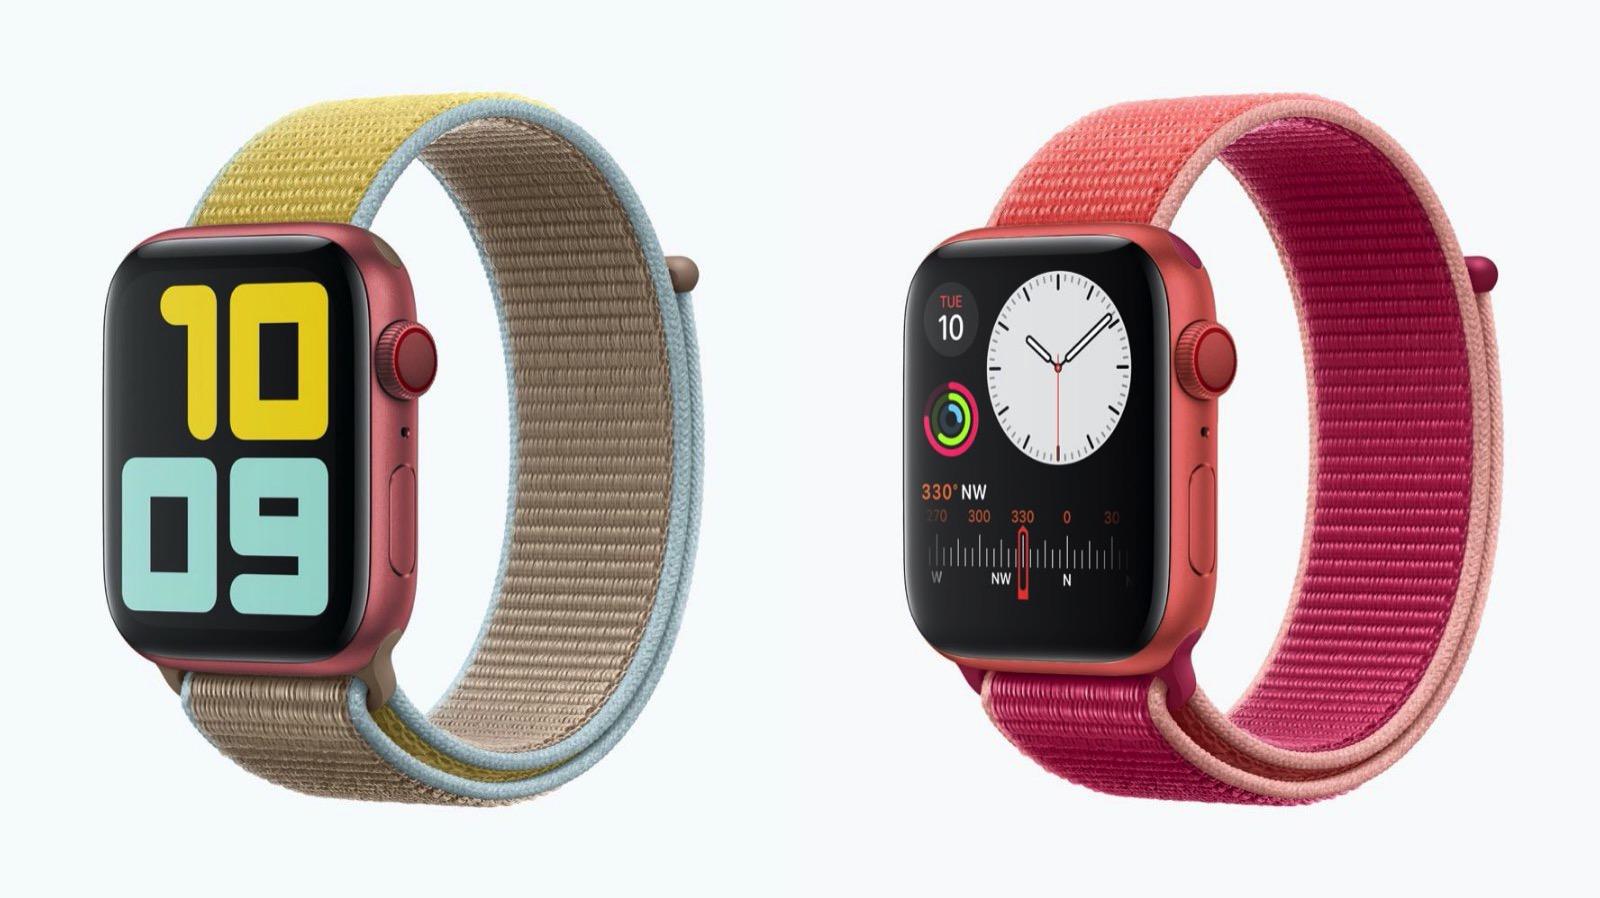 Apple-Watch-Product-Red-Model.jpg